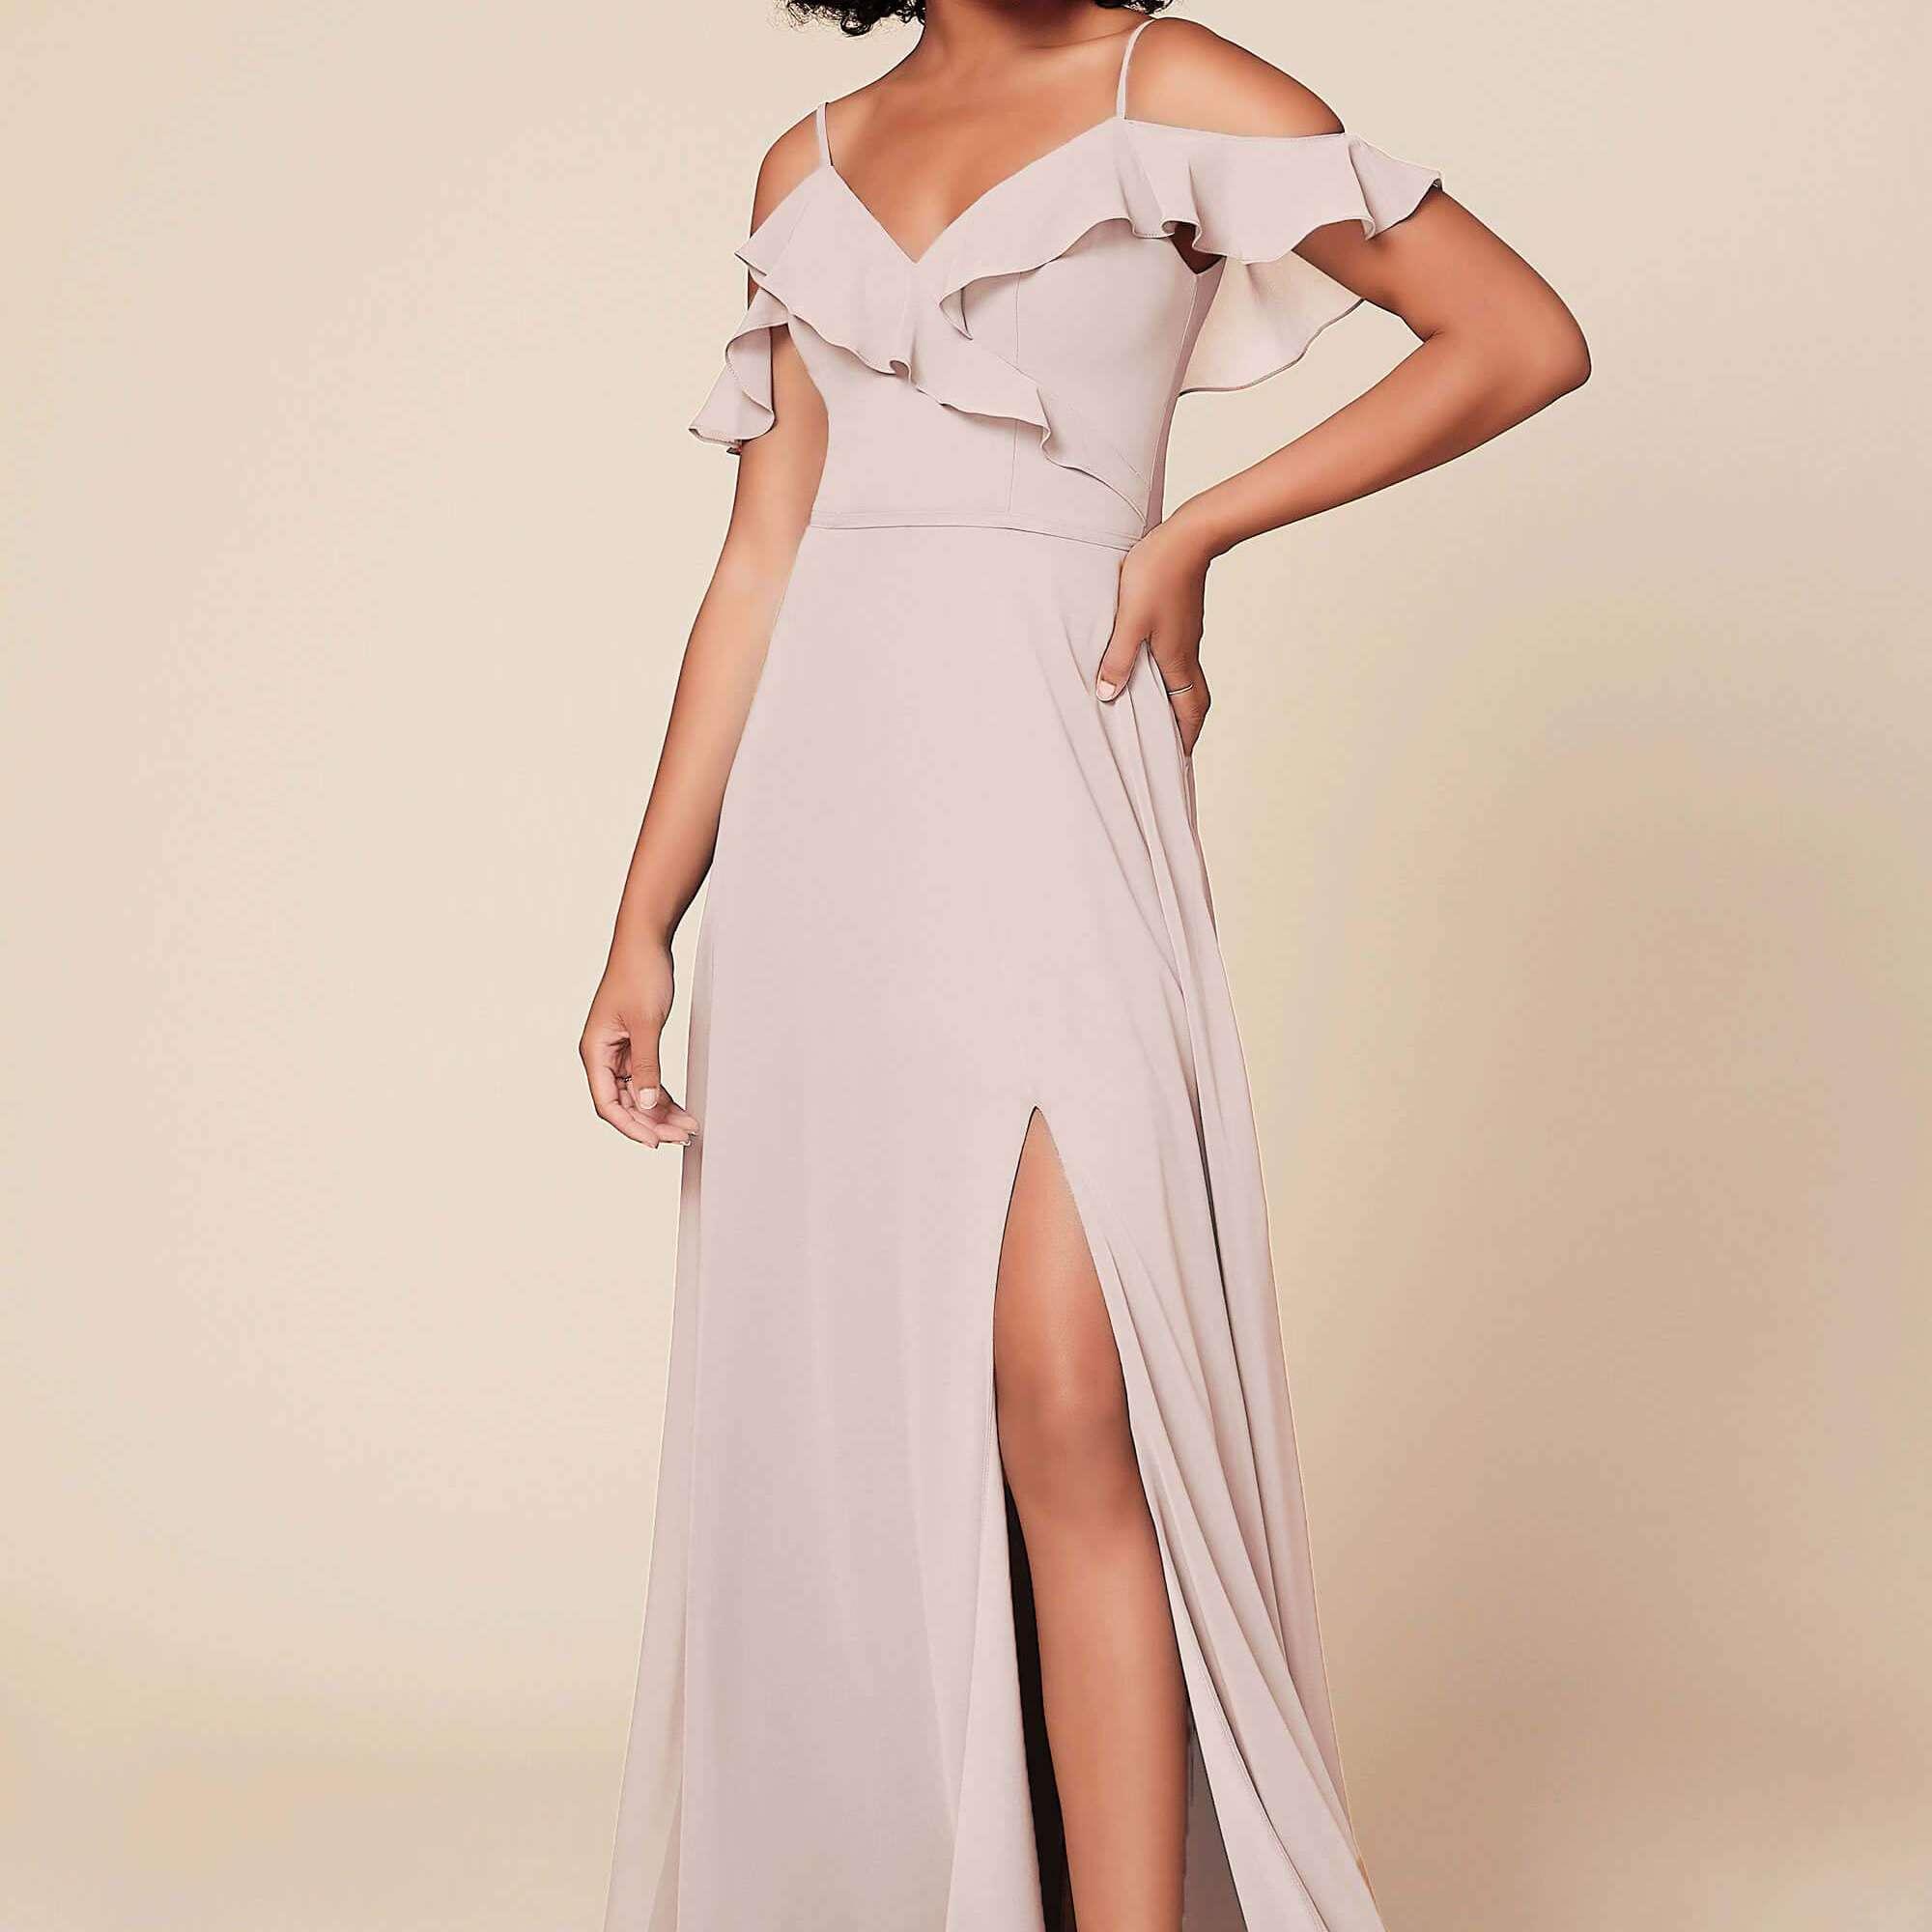 Dear Cleo Layla Bridesmaid Dress